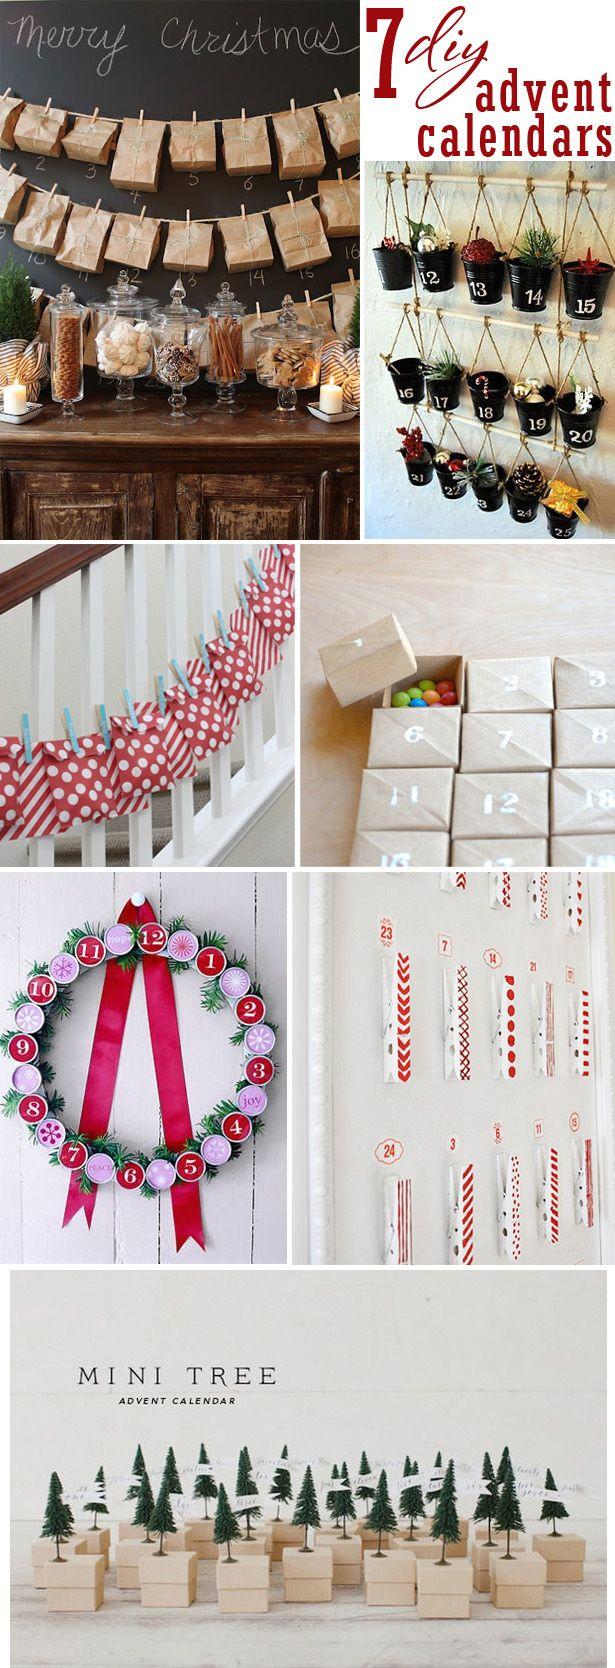 Diy Calendar Uk : The best advent calendar boxes ideas on pinterest